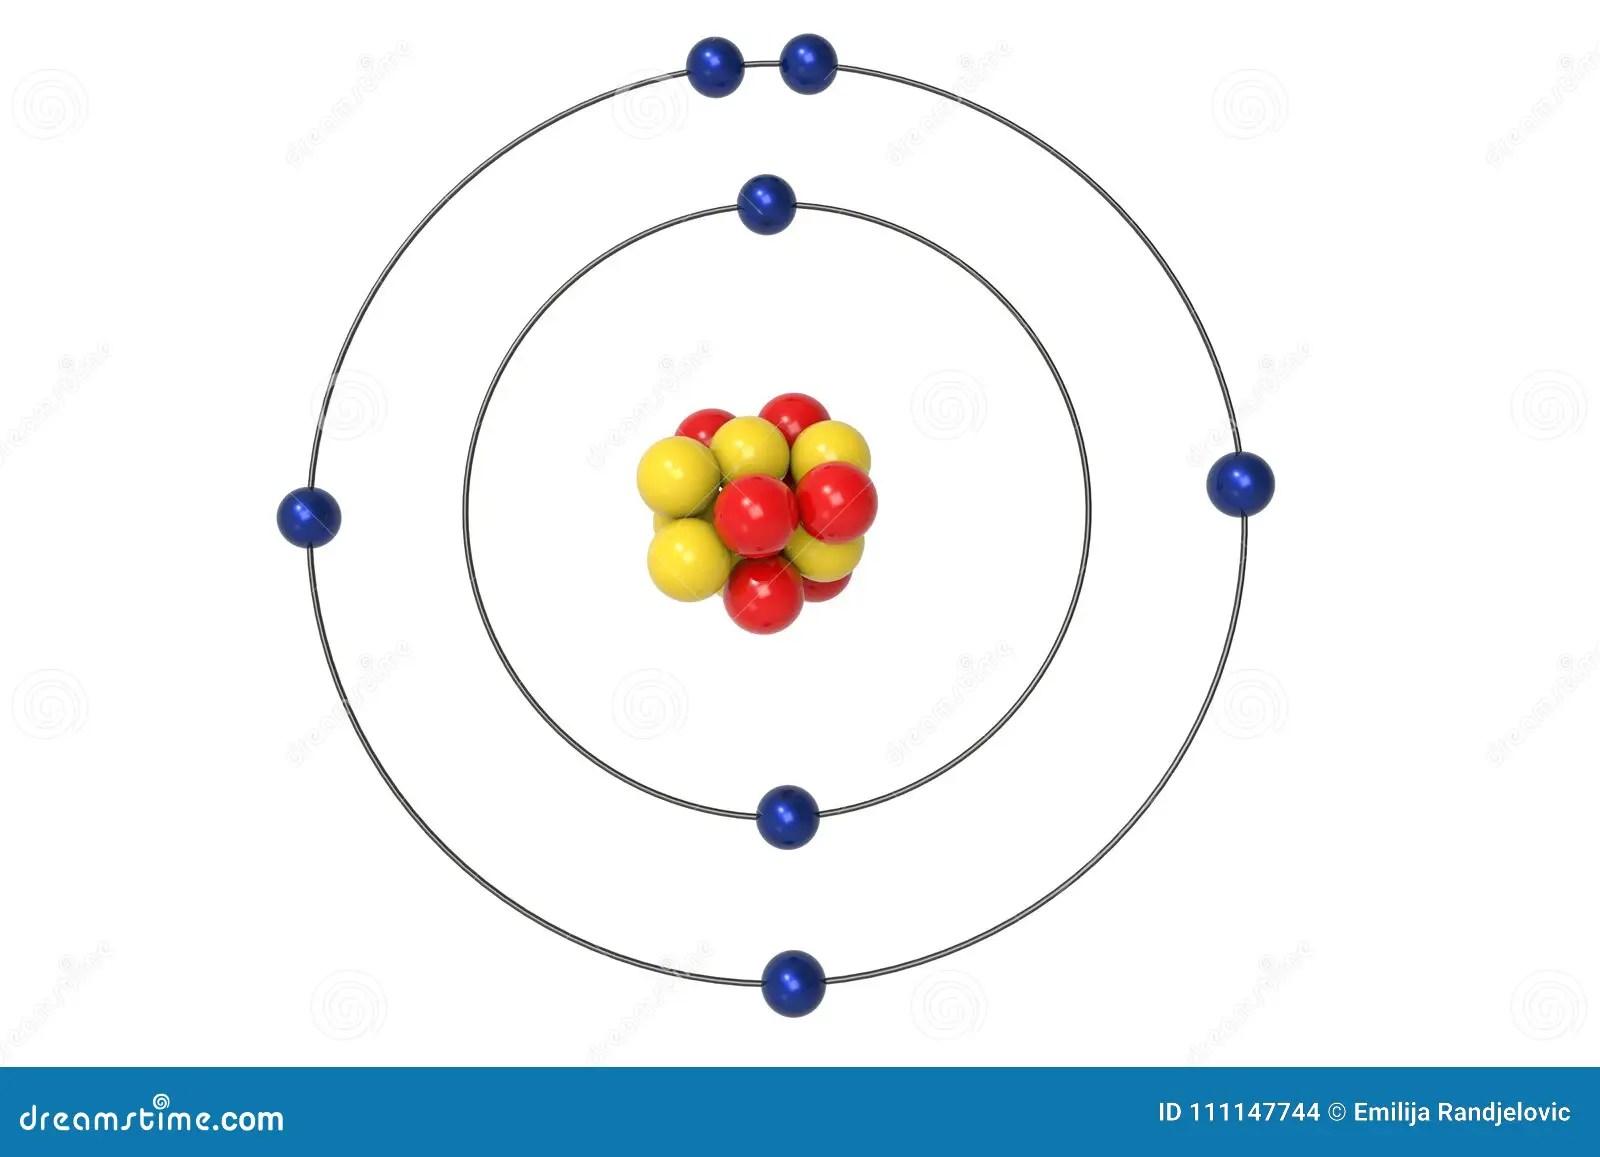 francium atom diagram 2015 jeep grand cherokee radio wiring modèle d 39atom bohr 39azote avec le proton neutron et l